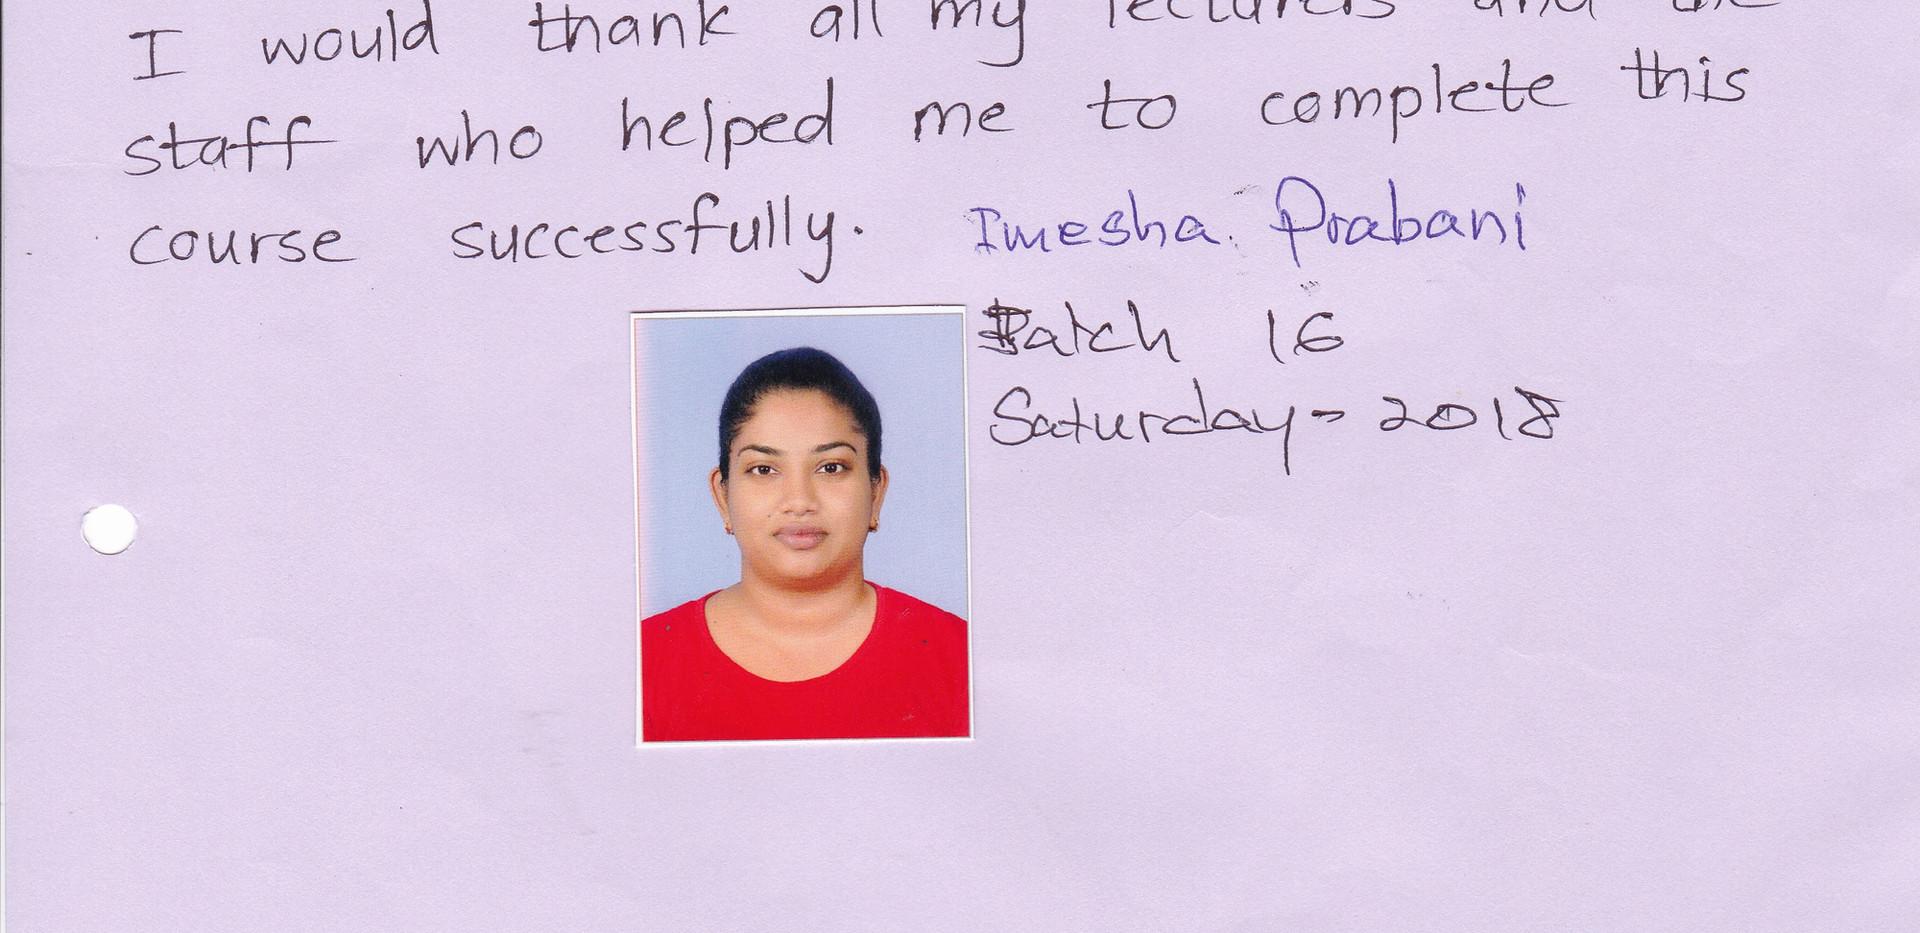 Imesha Prabani - Malabe.jpg